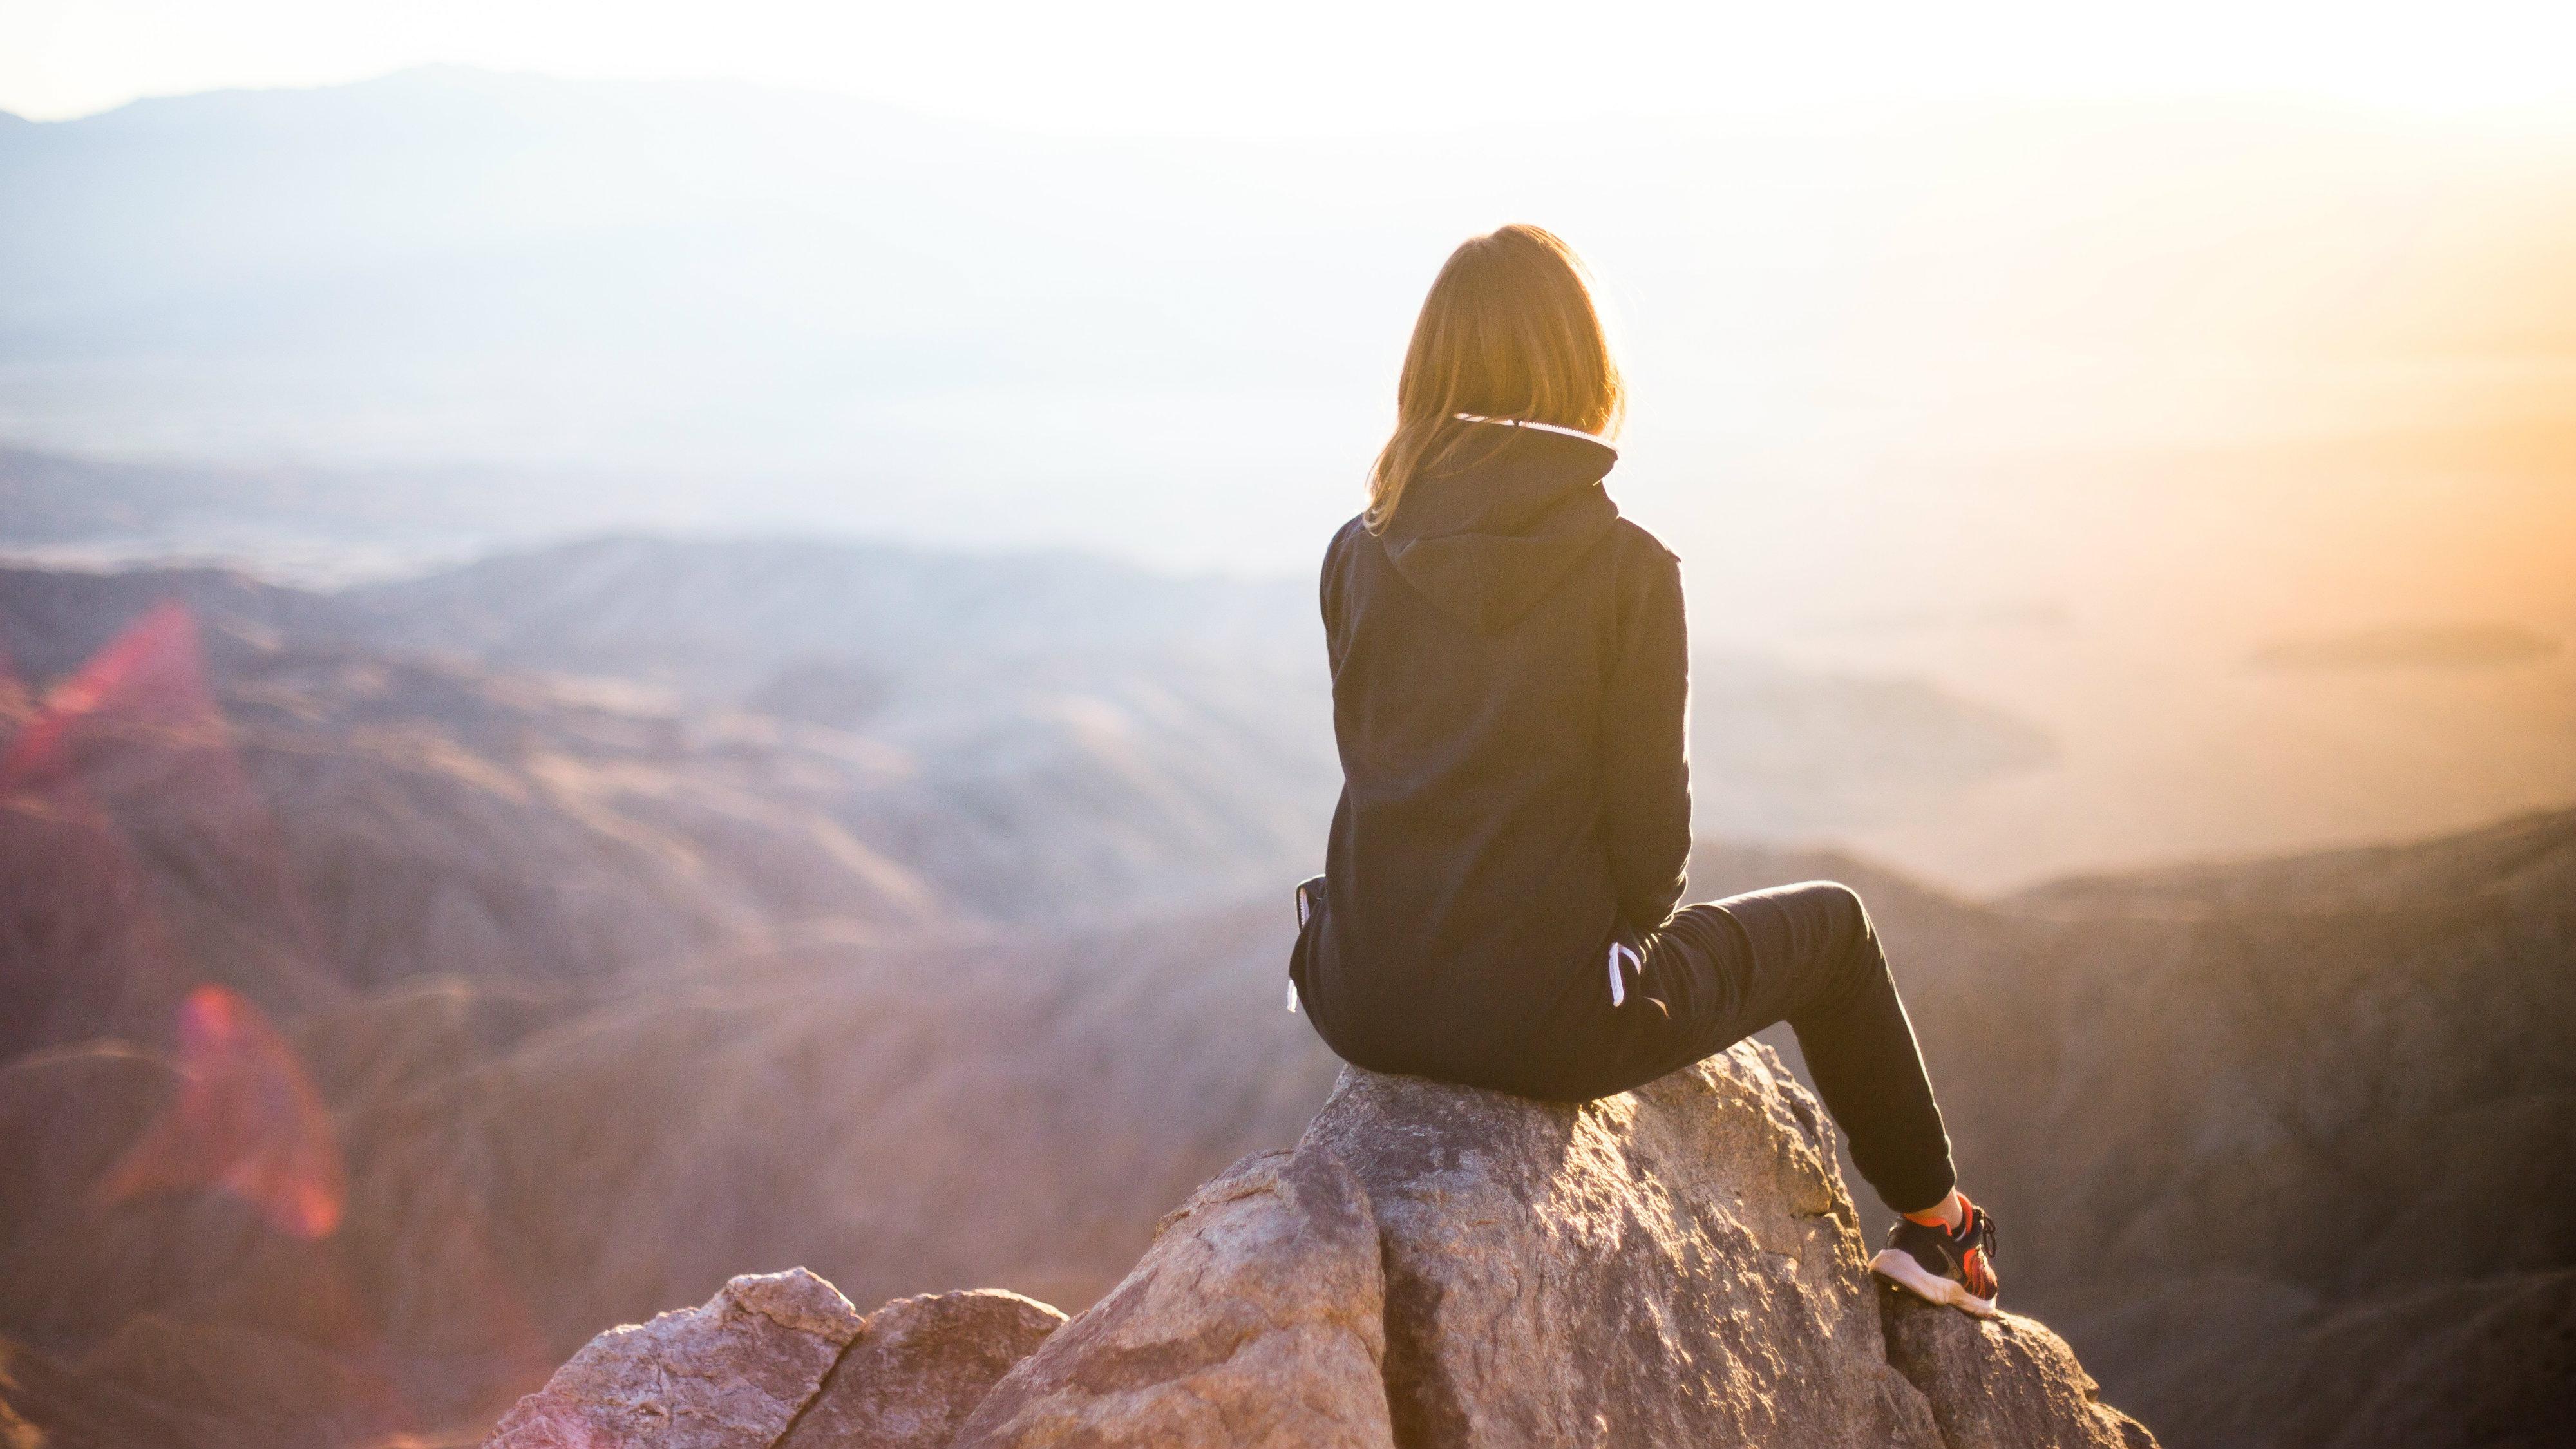 fearless women in a world of opportunities